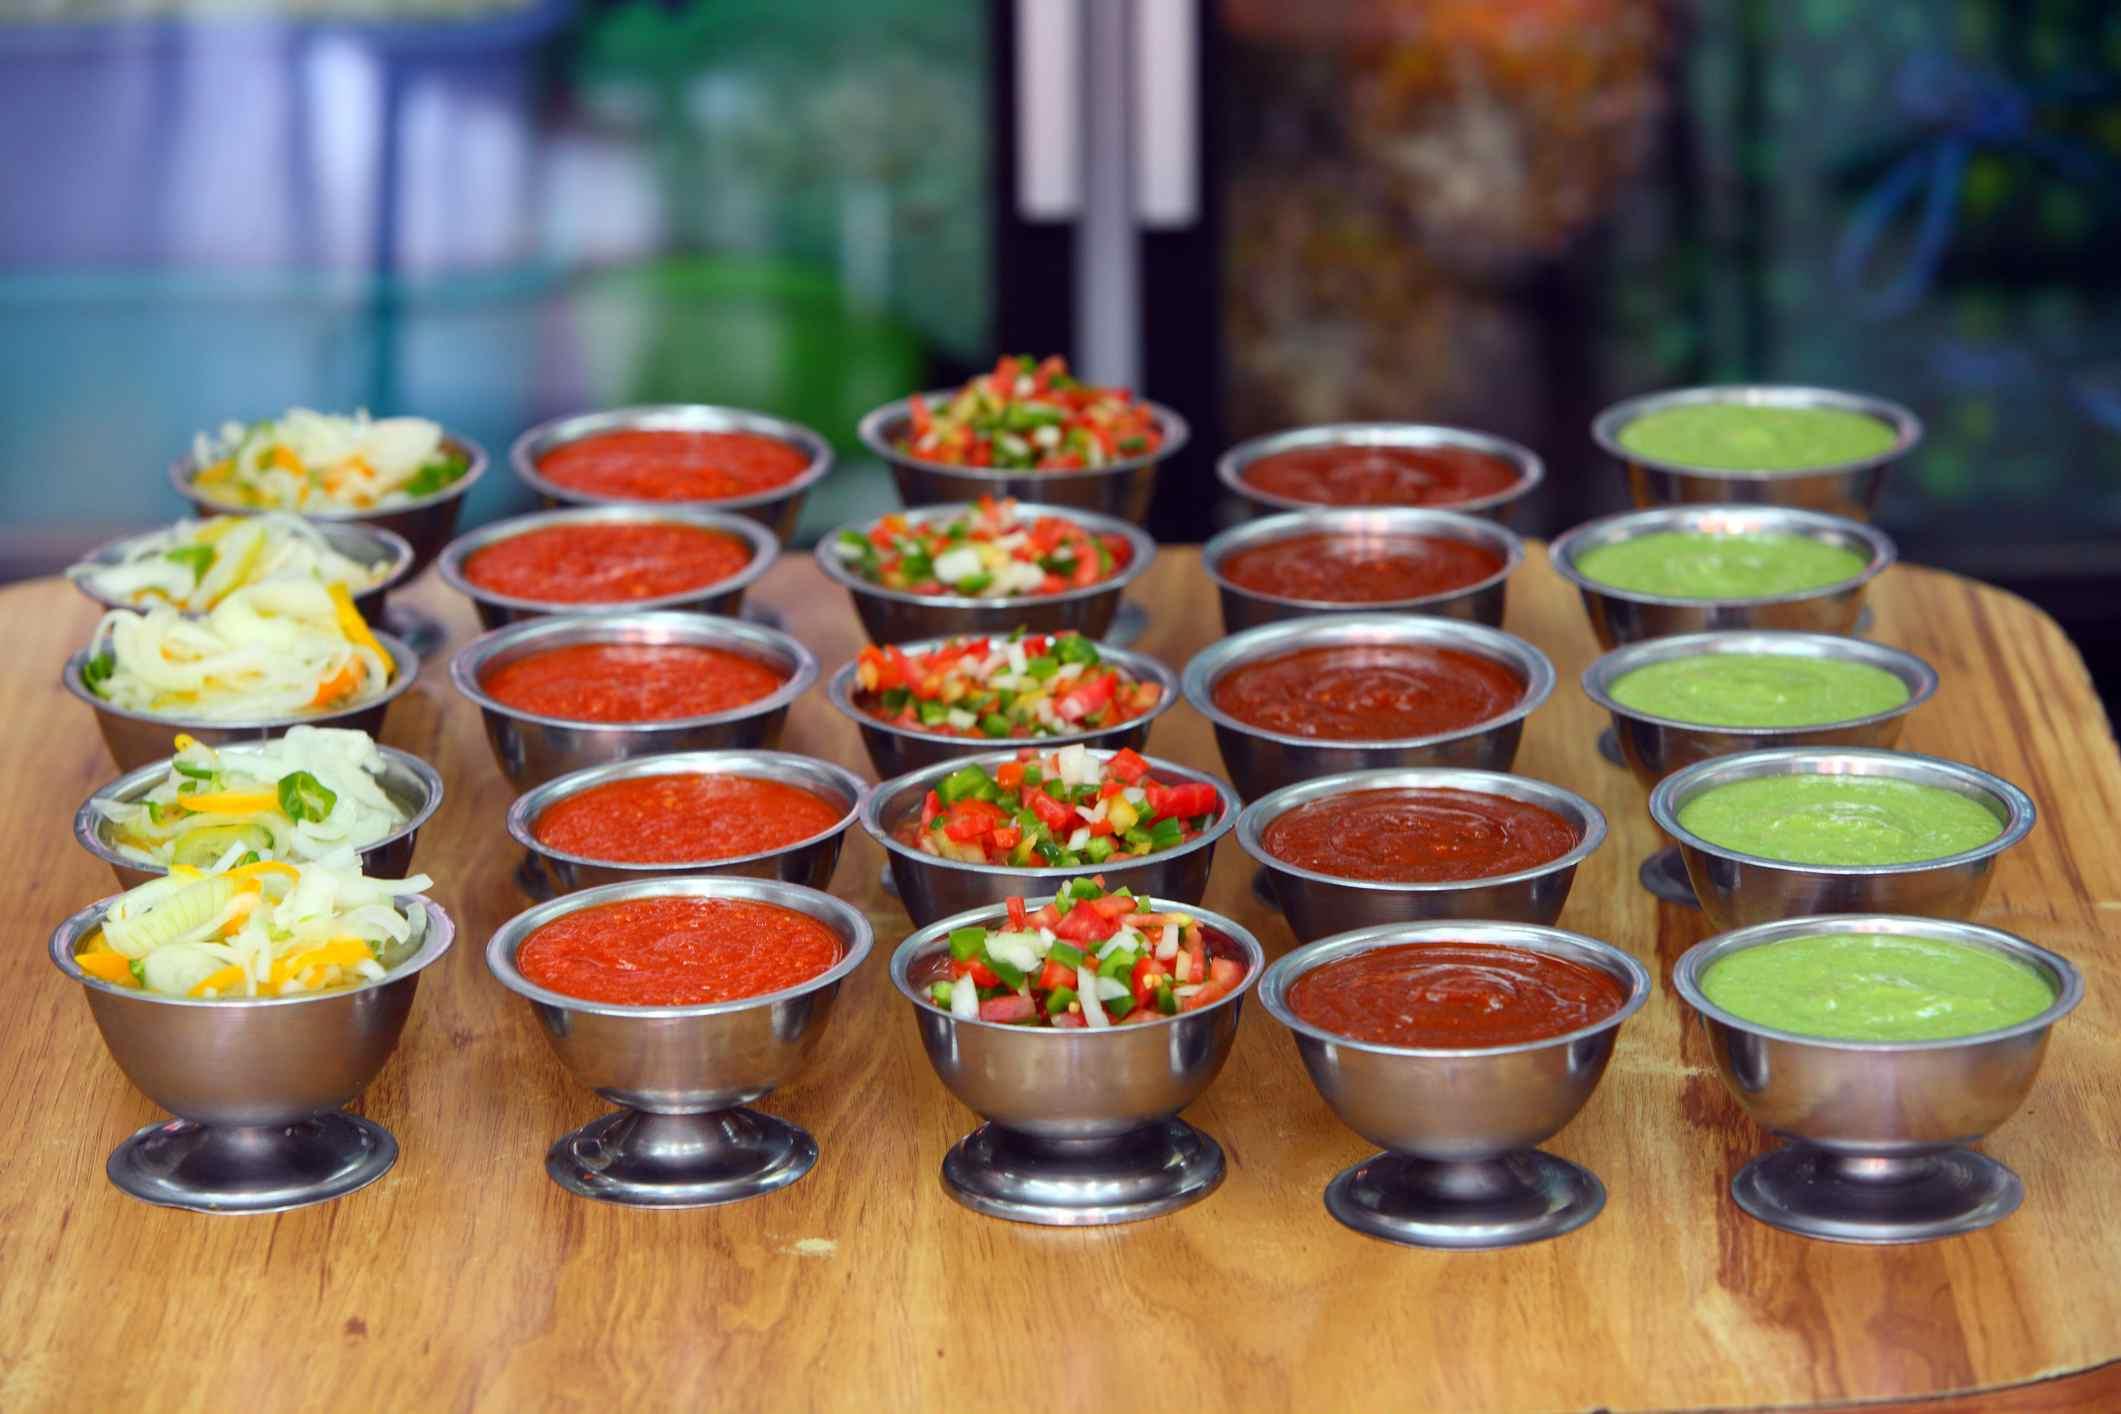 salsas at a mexican restaurant